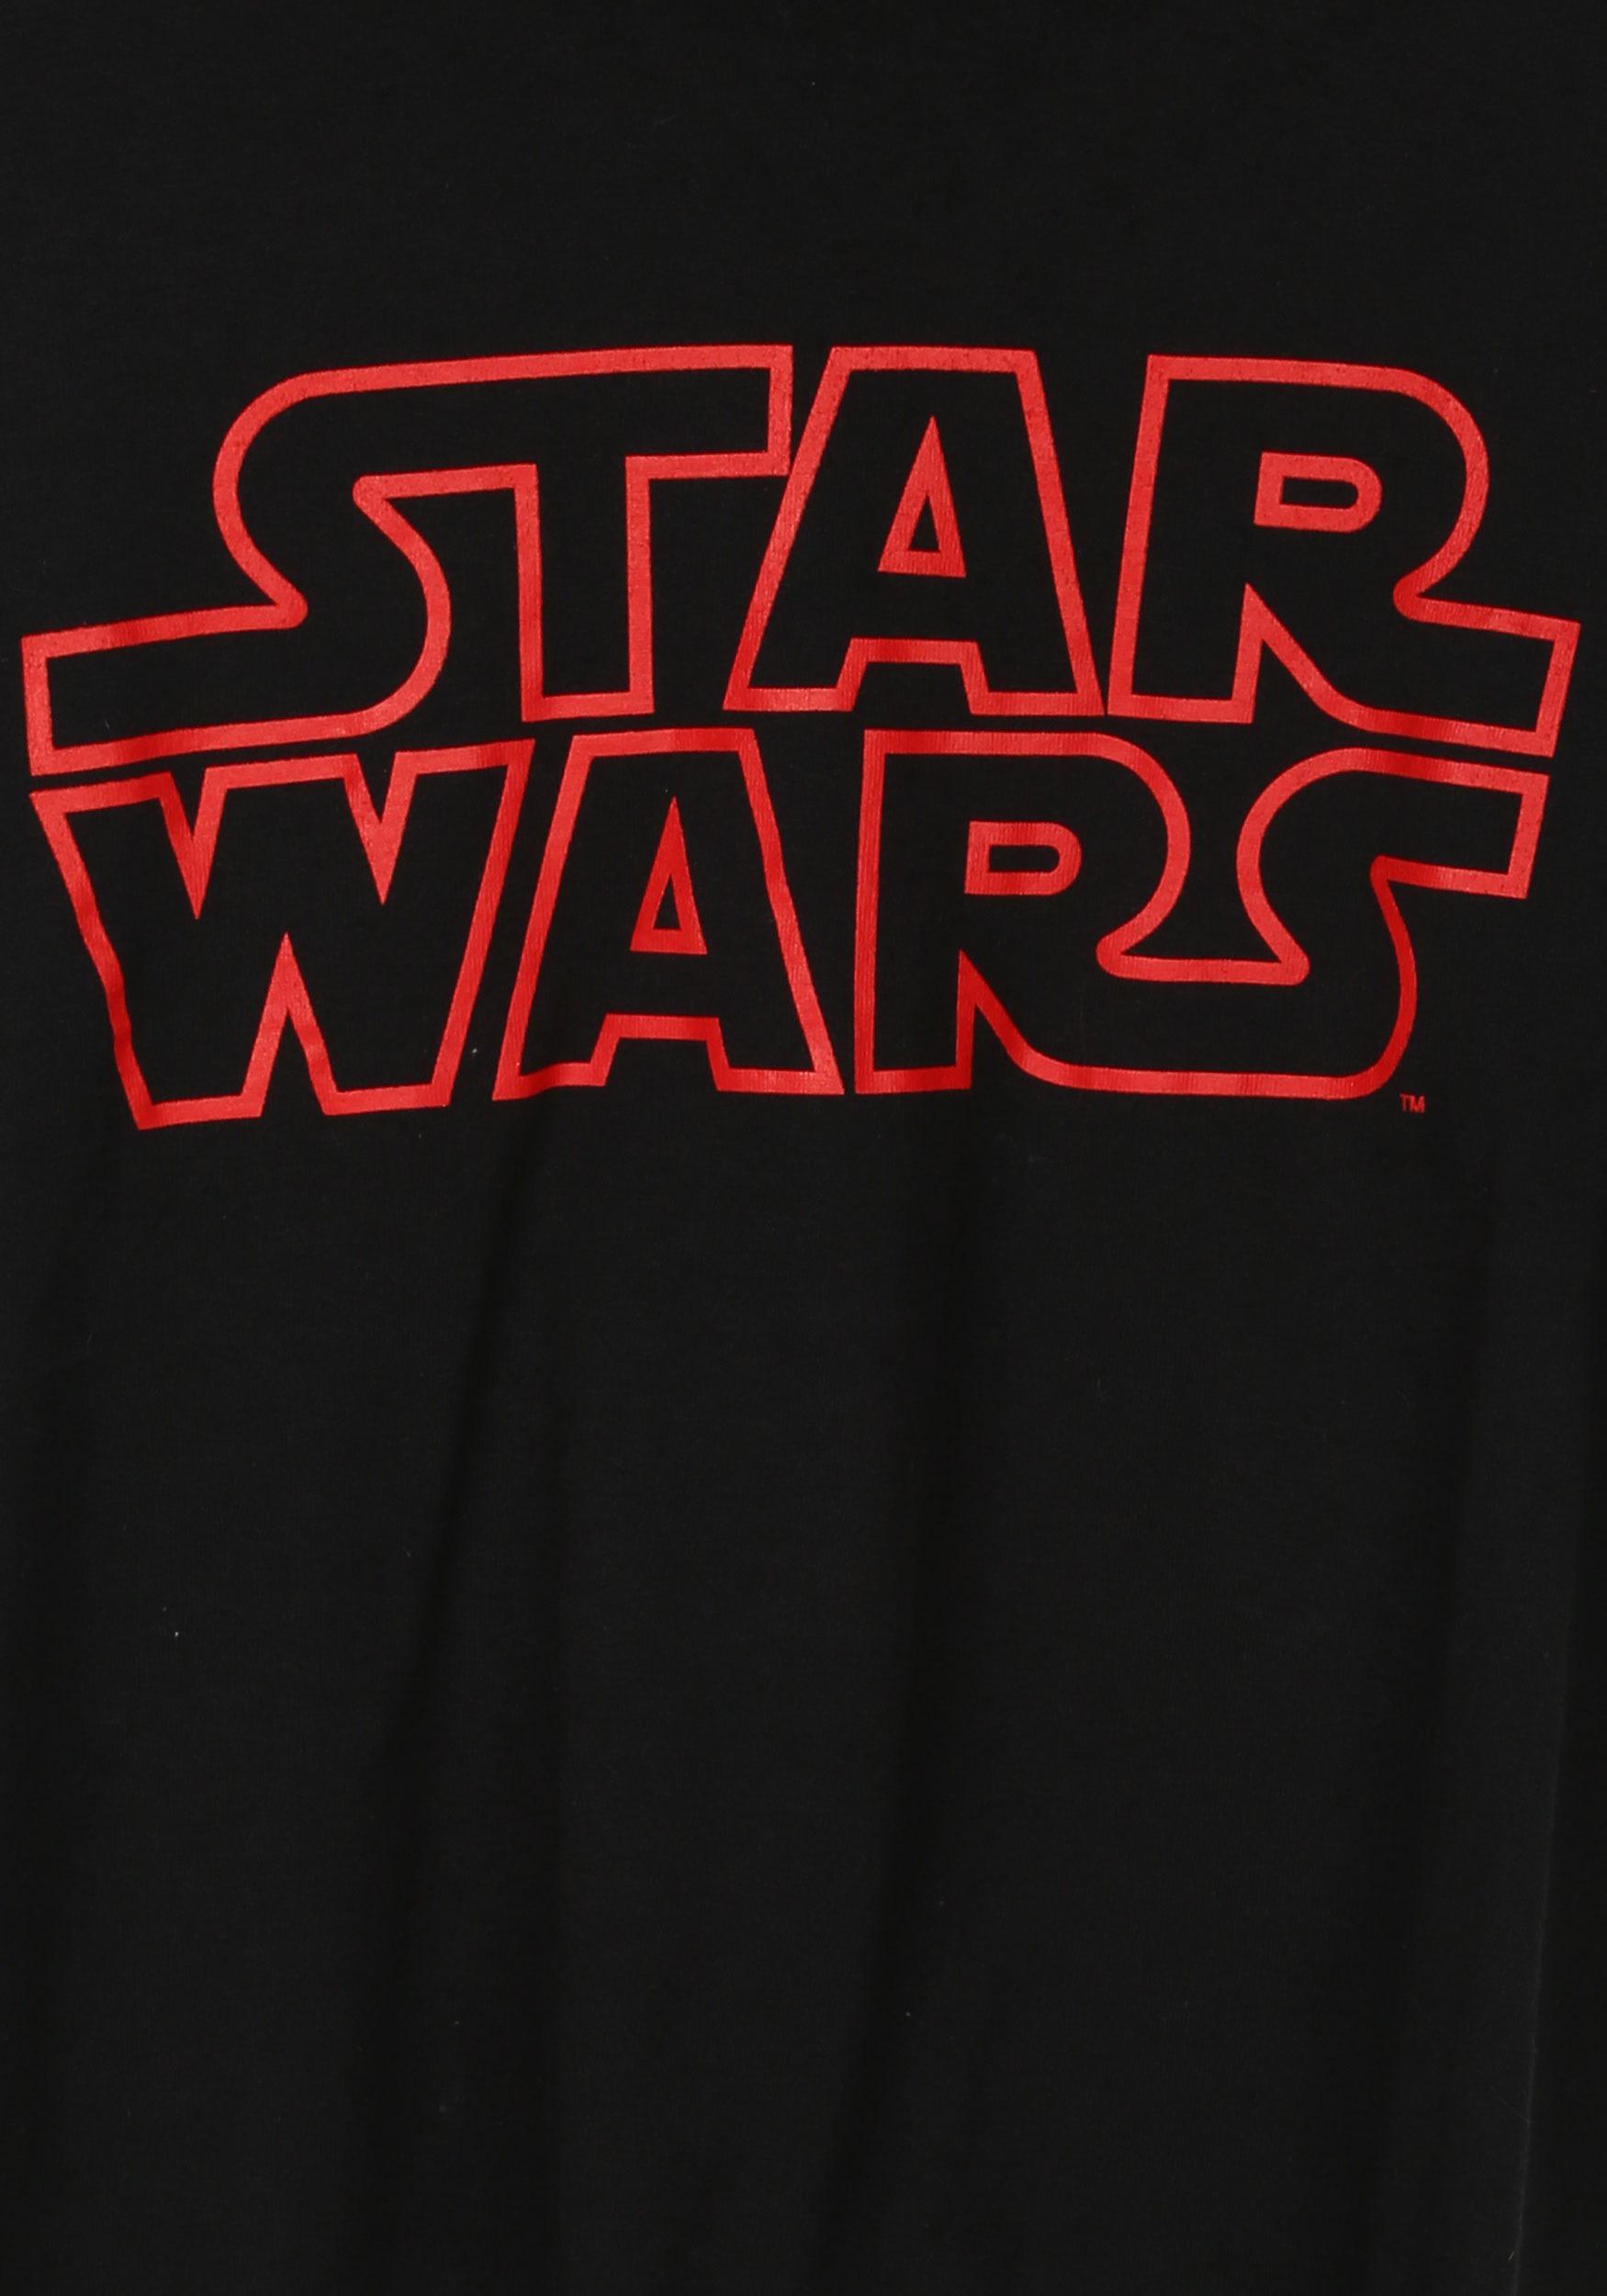 star wars classic logo red outline tshirt